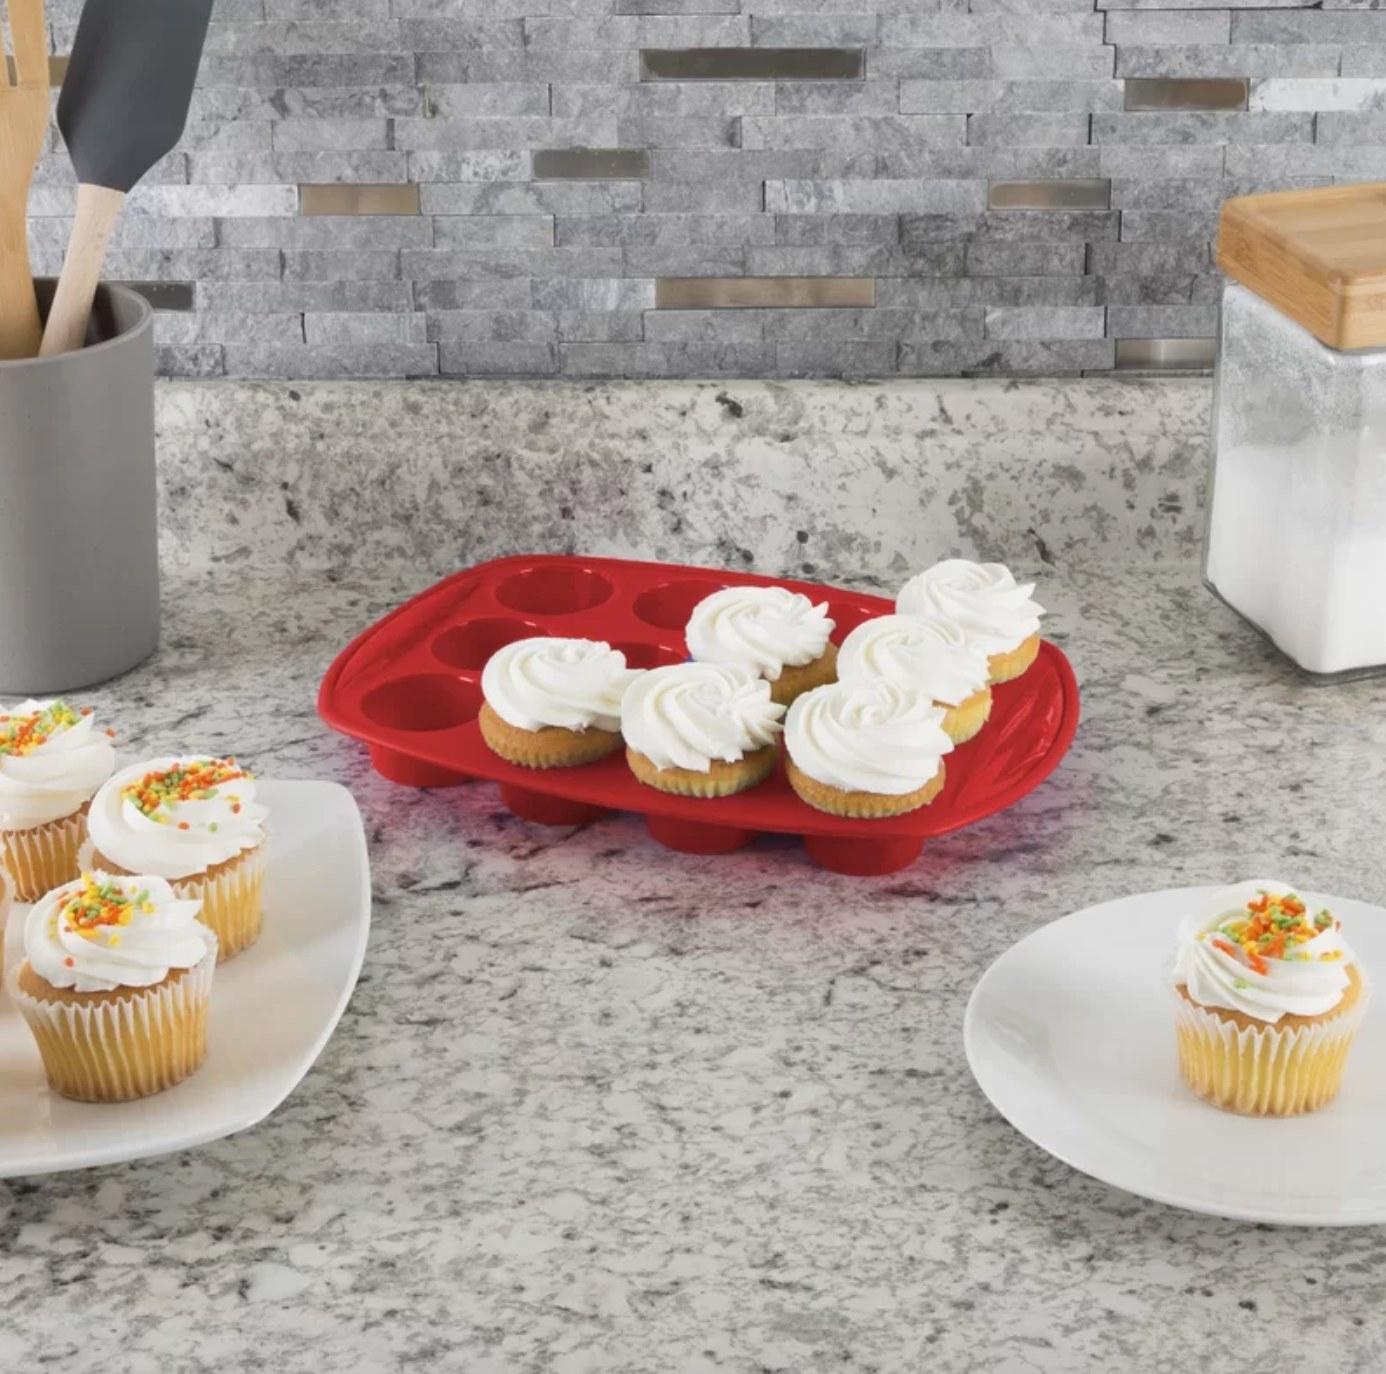 The 18 piece nonstick bakeware set